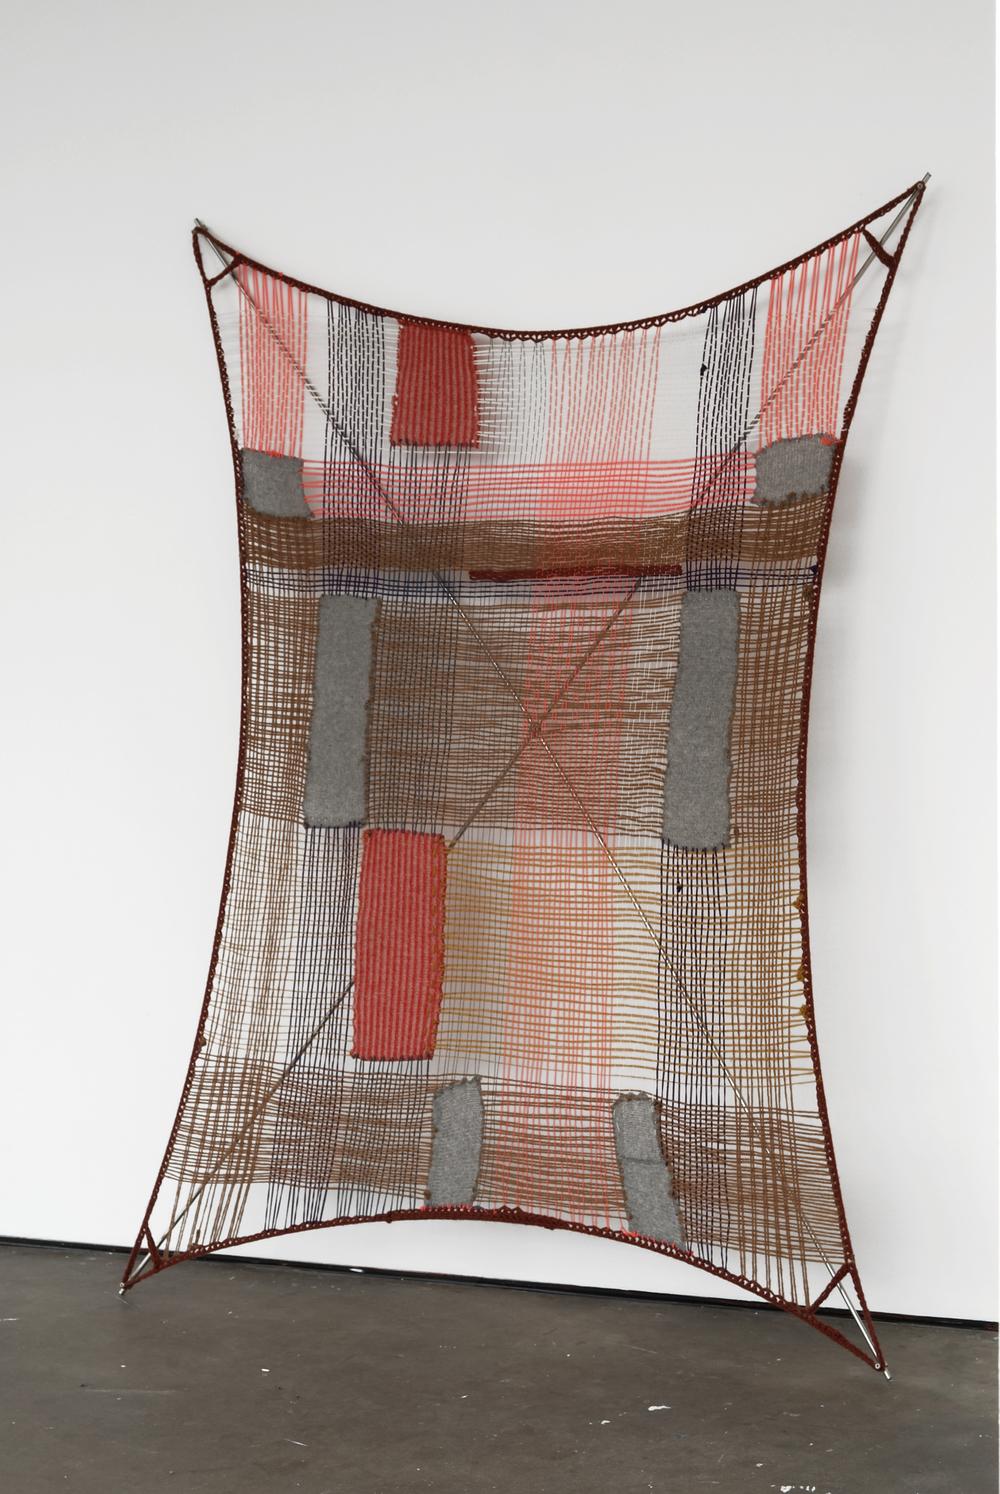 Insert 2009 wool, fibre, stainless steel, rubber 216 x 164 x 16cm